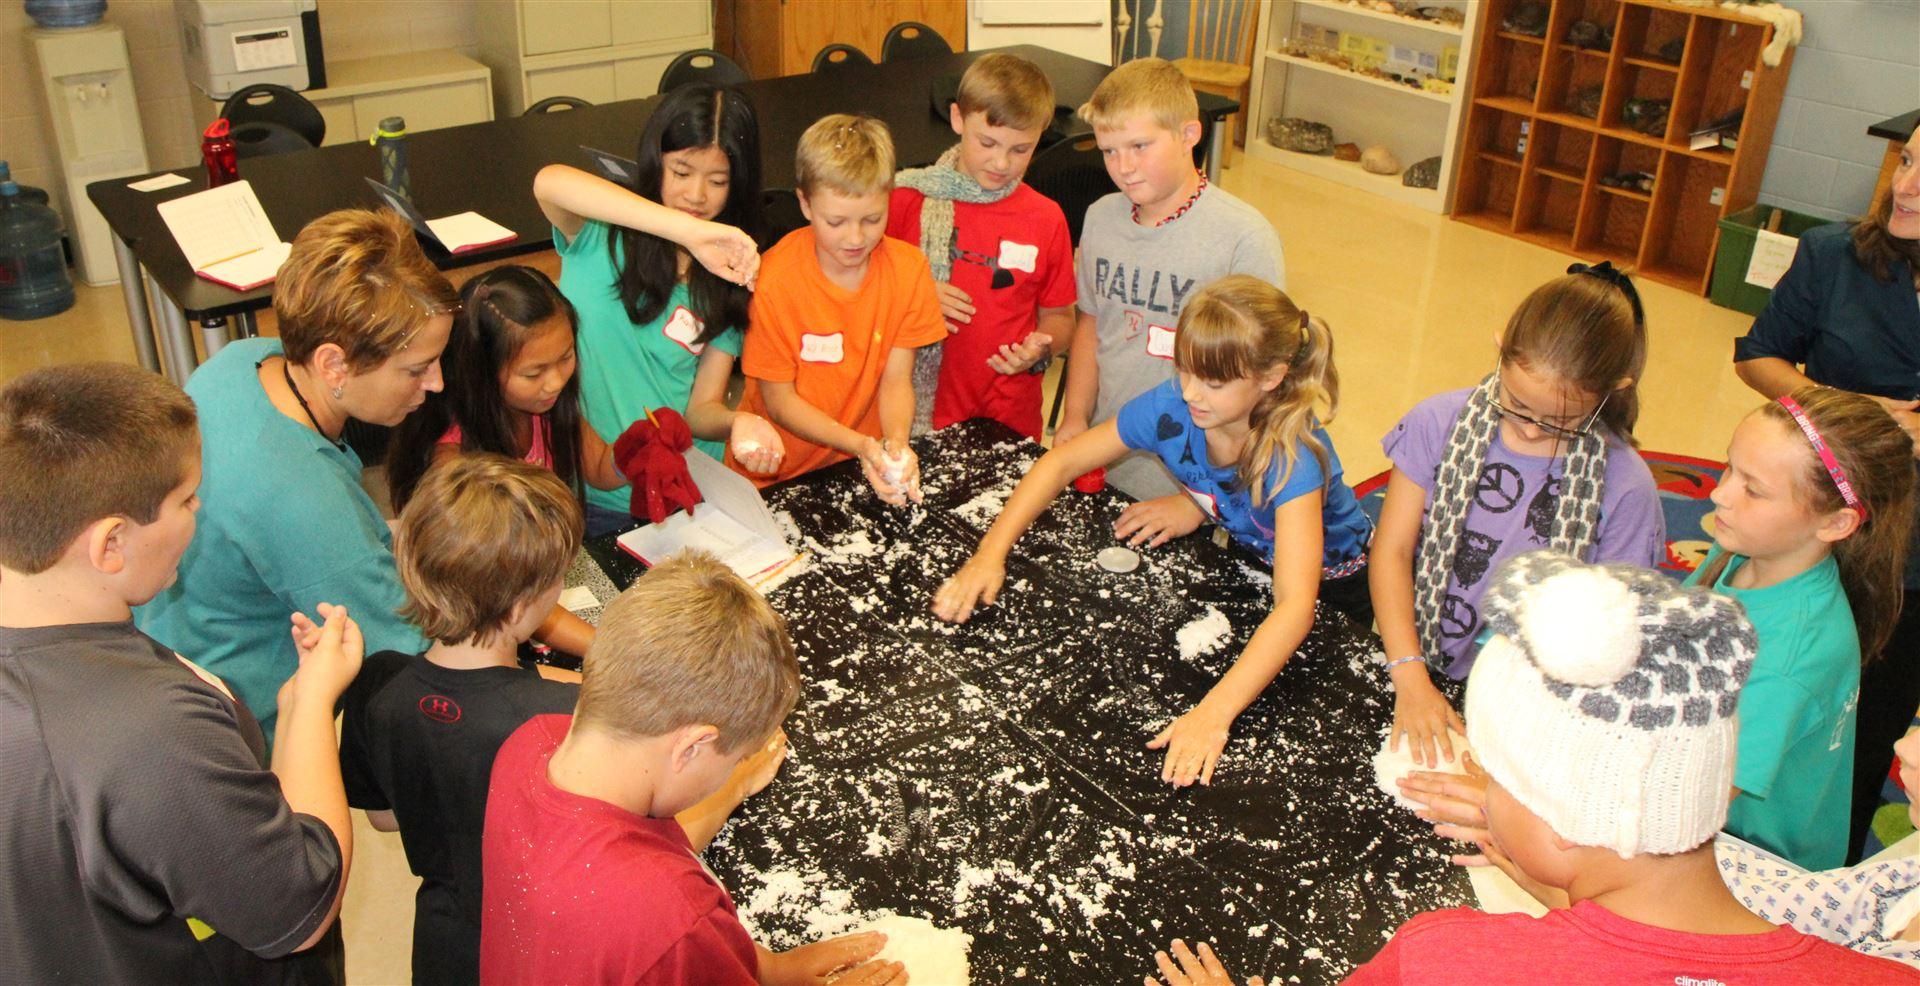 Worksheet Math Programs For Elementary Students math programs for gifted elementary students stanford epgy worksheet briarwood students